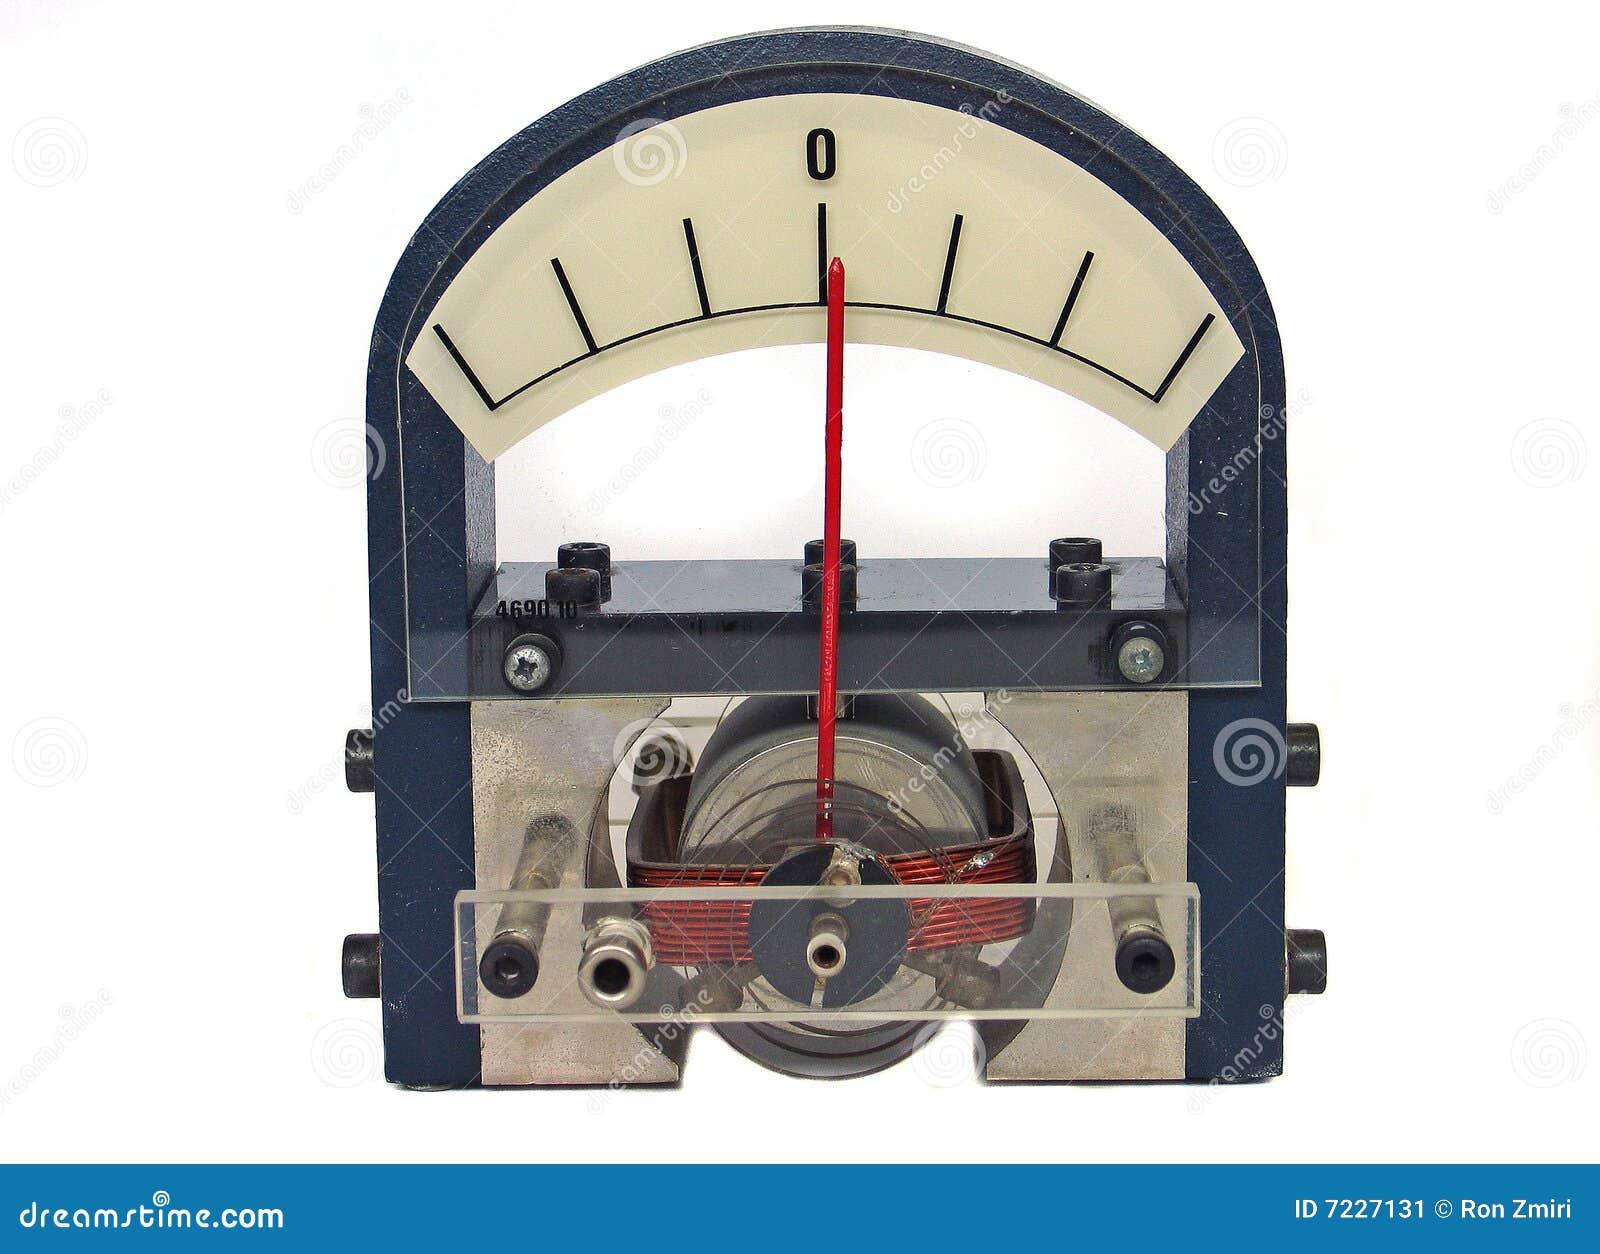 Multimeter measuring device